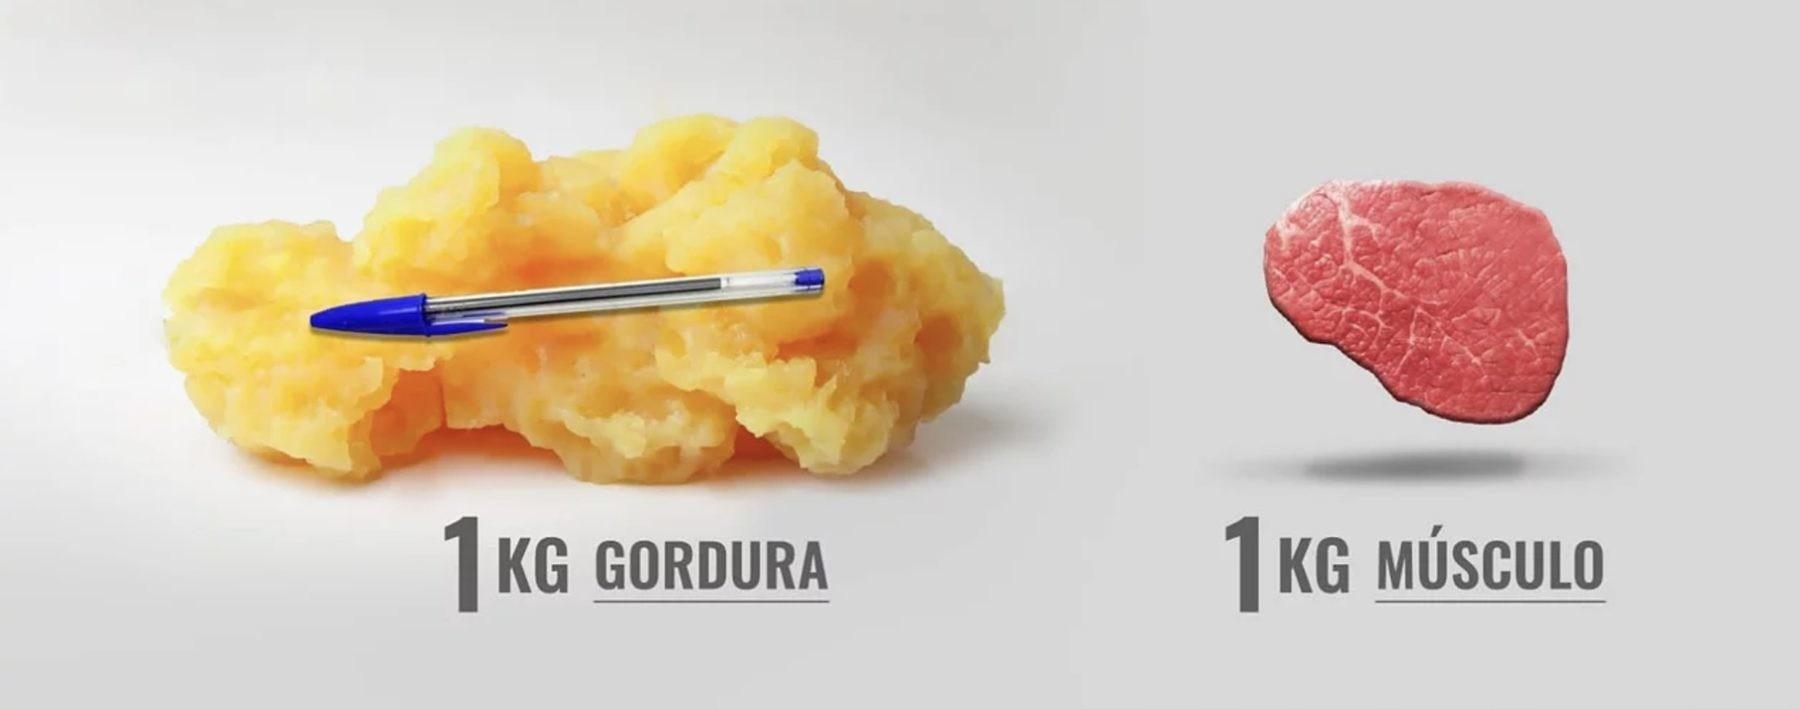 1kg-de-gordura-vs-1kg-de-musculo-e1523152115709